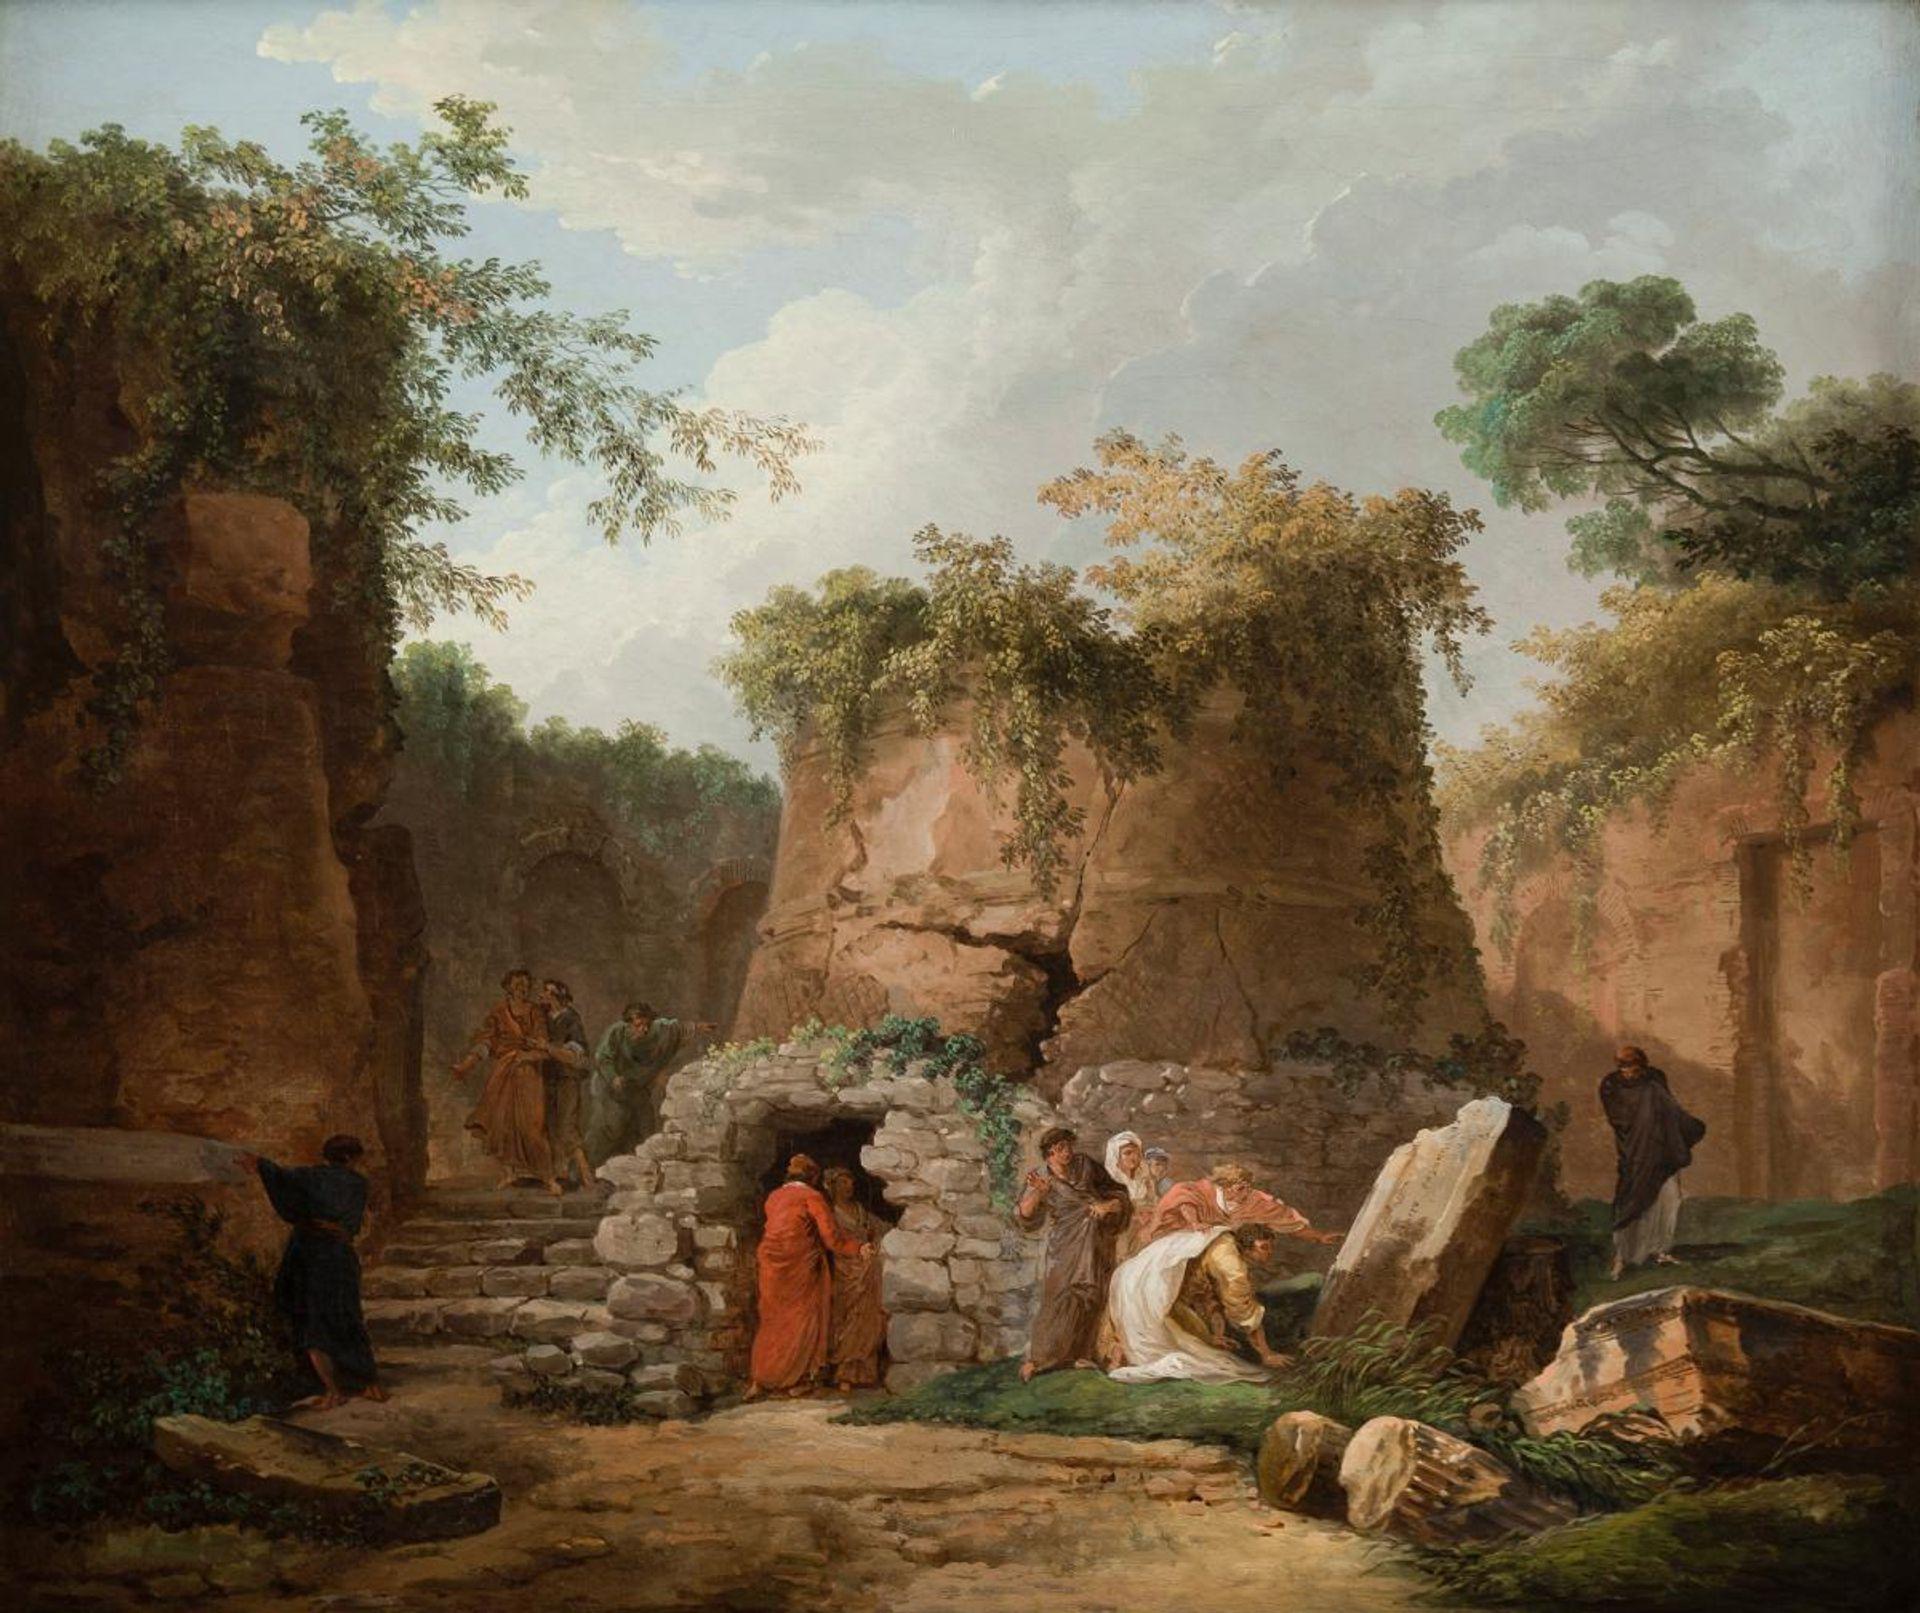 The Tomb of Virgil at Posilipo, near Naples (1784) by Hubert Robert courtesy La Salle University